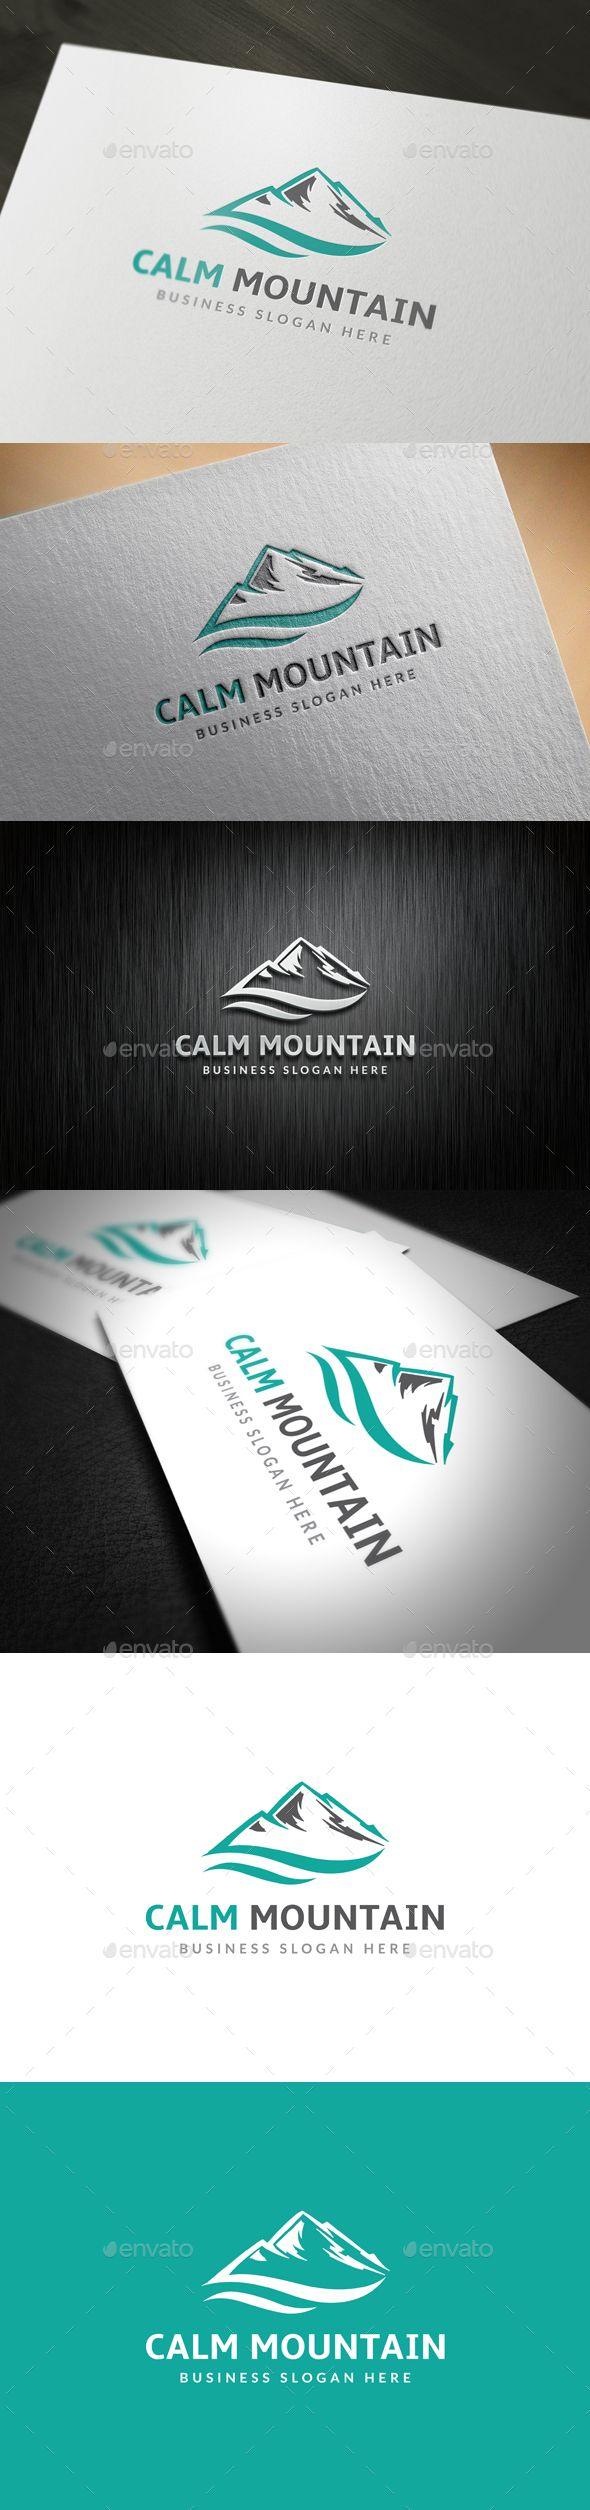 Mountain Logo Template PSD, Vector EPS, AI Illustrator #logotype Download here: http://graphicriver.net/item/mountain-logo/14122547?ref=ksioks